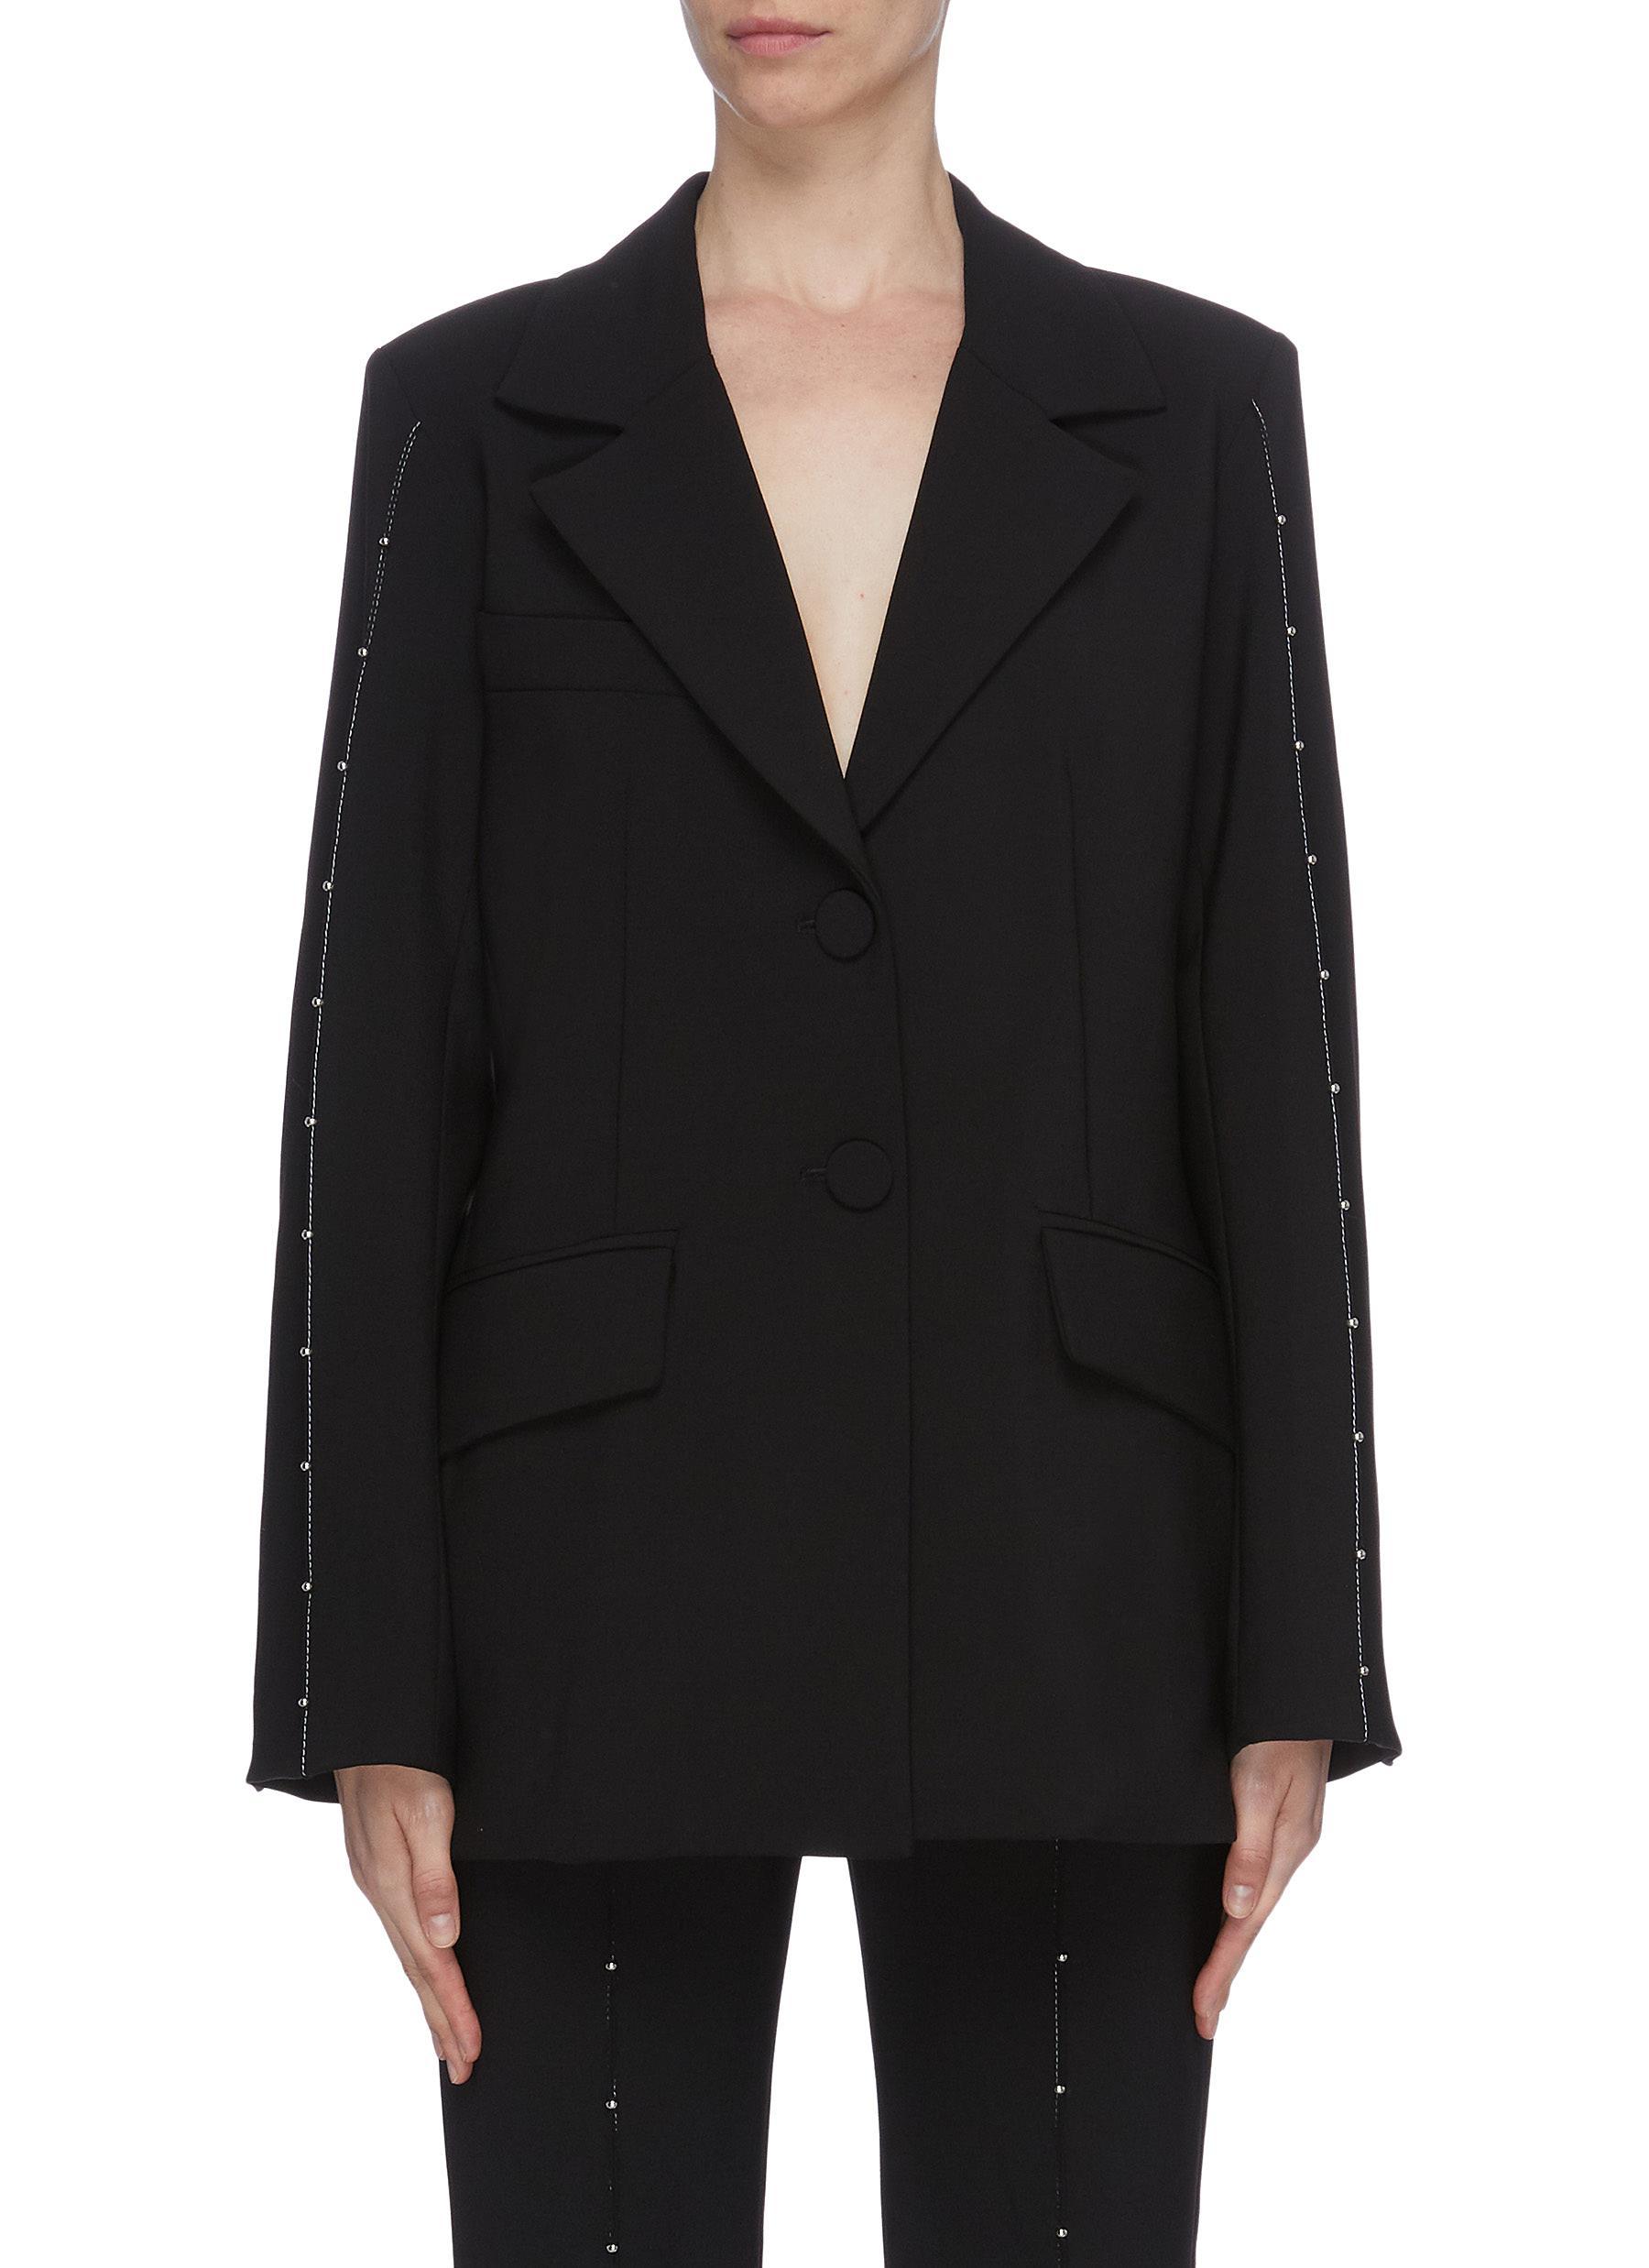 Patti embellished blazer by Ellery